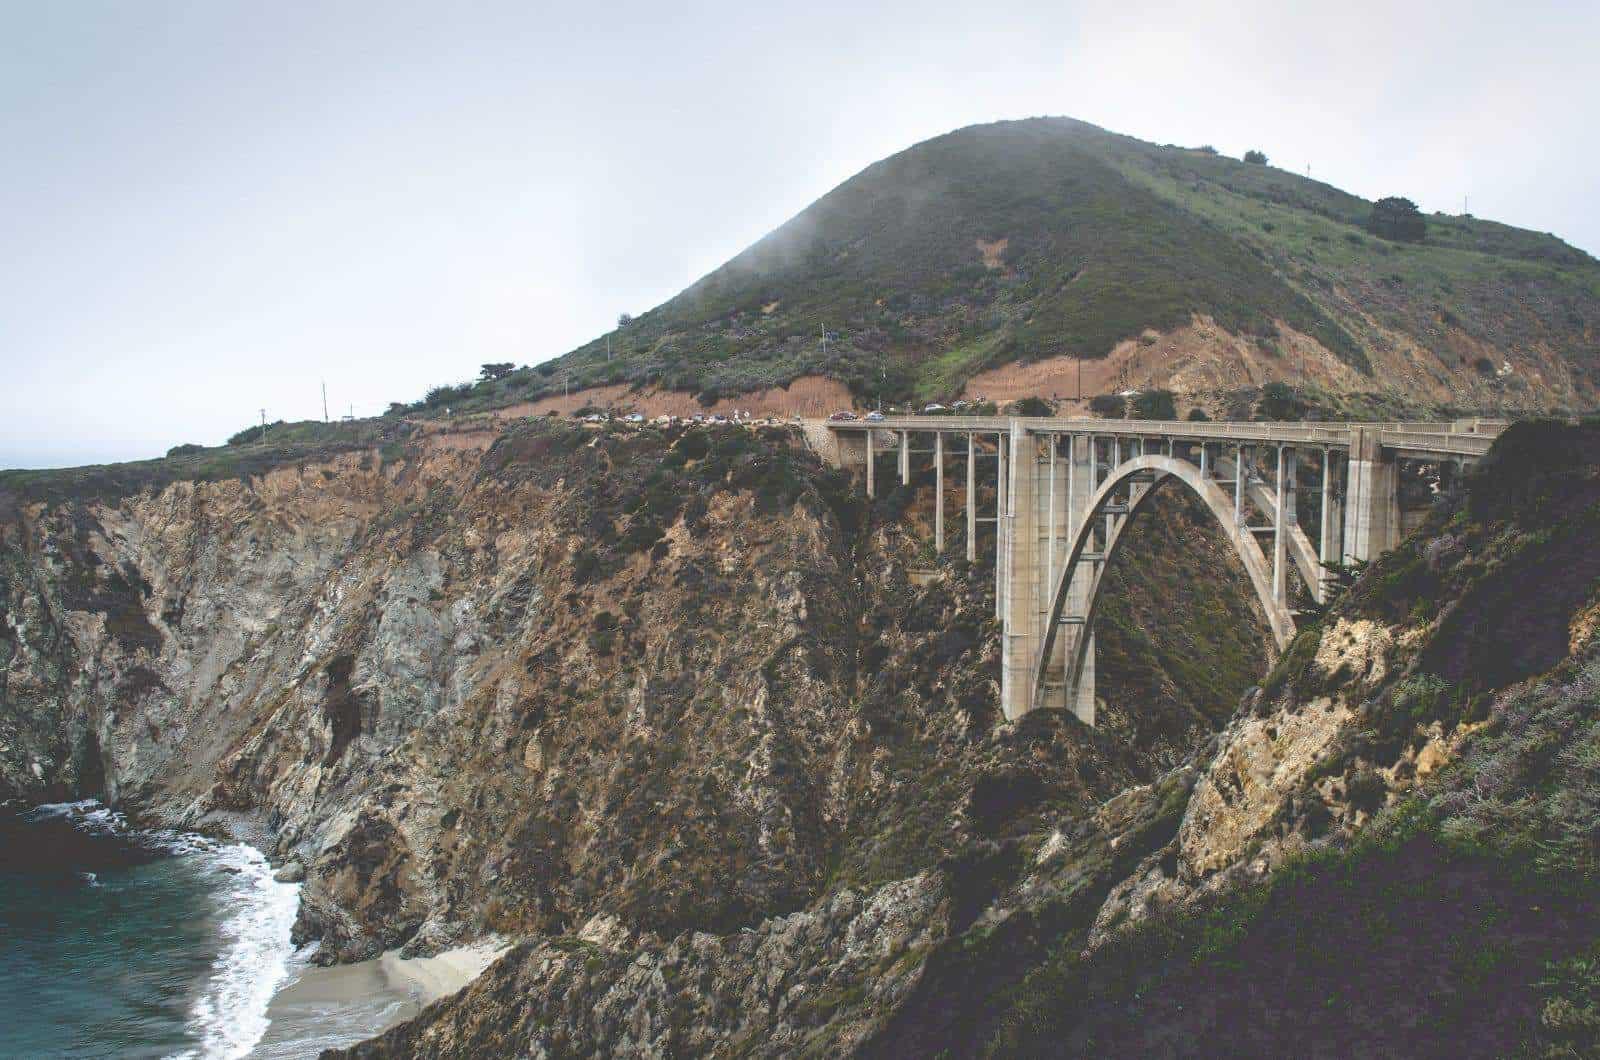 Bixby Bridge, Montery California. Photo by Will Langenberg on Unsplash.